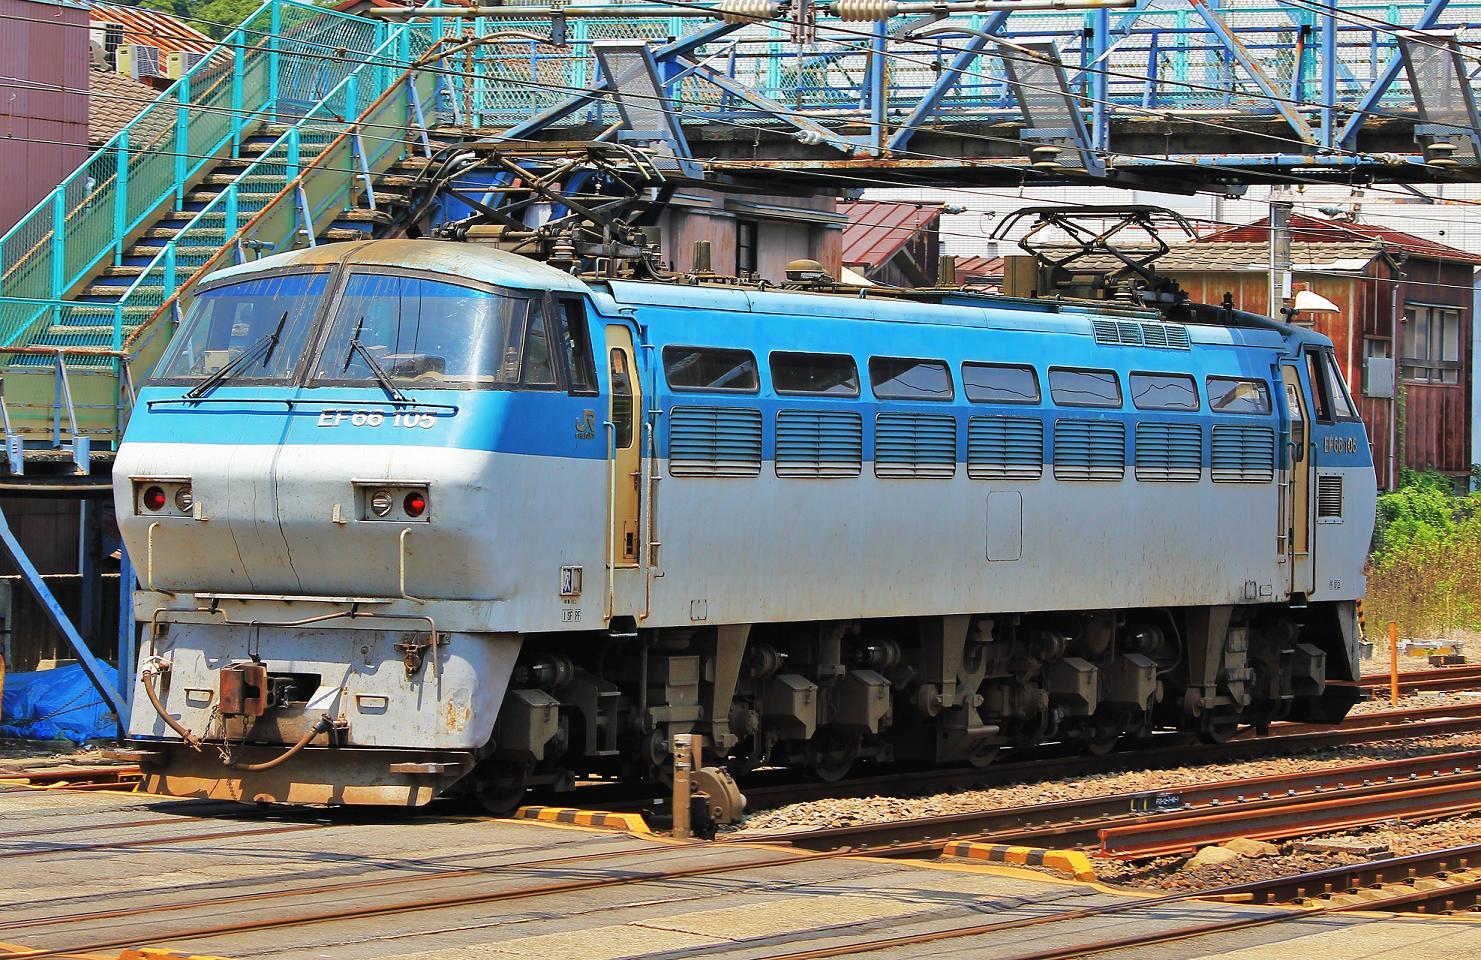 鉄道撮影日記2014        meitrenets.exblog.jp